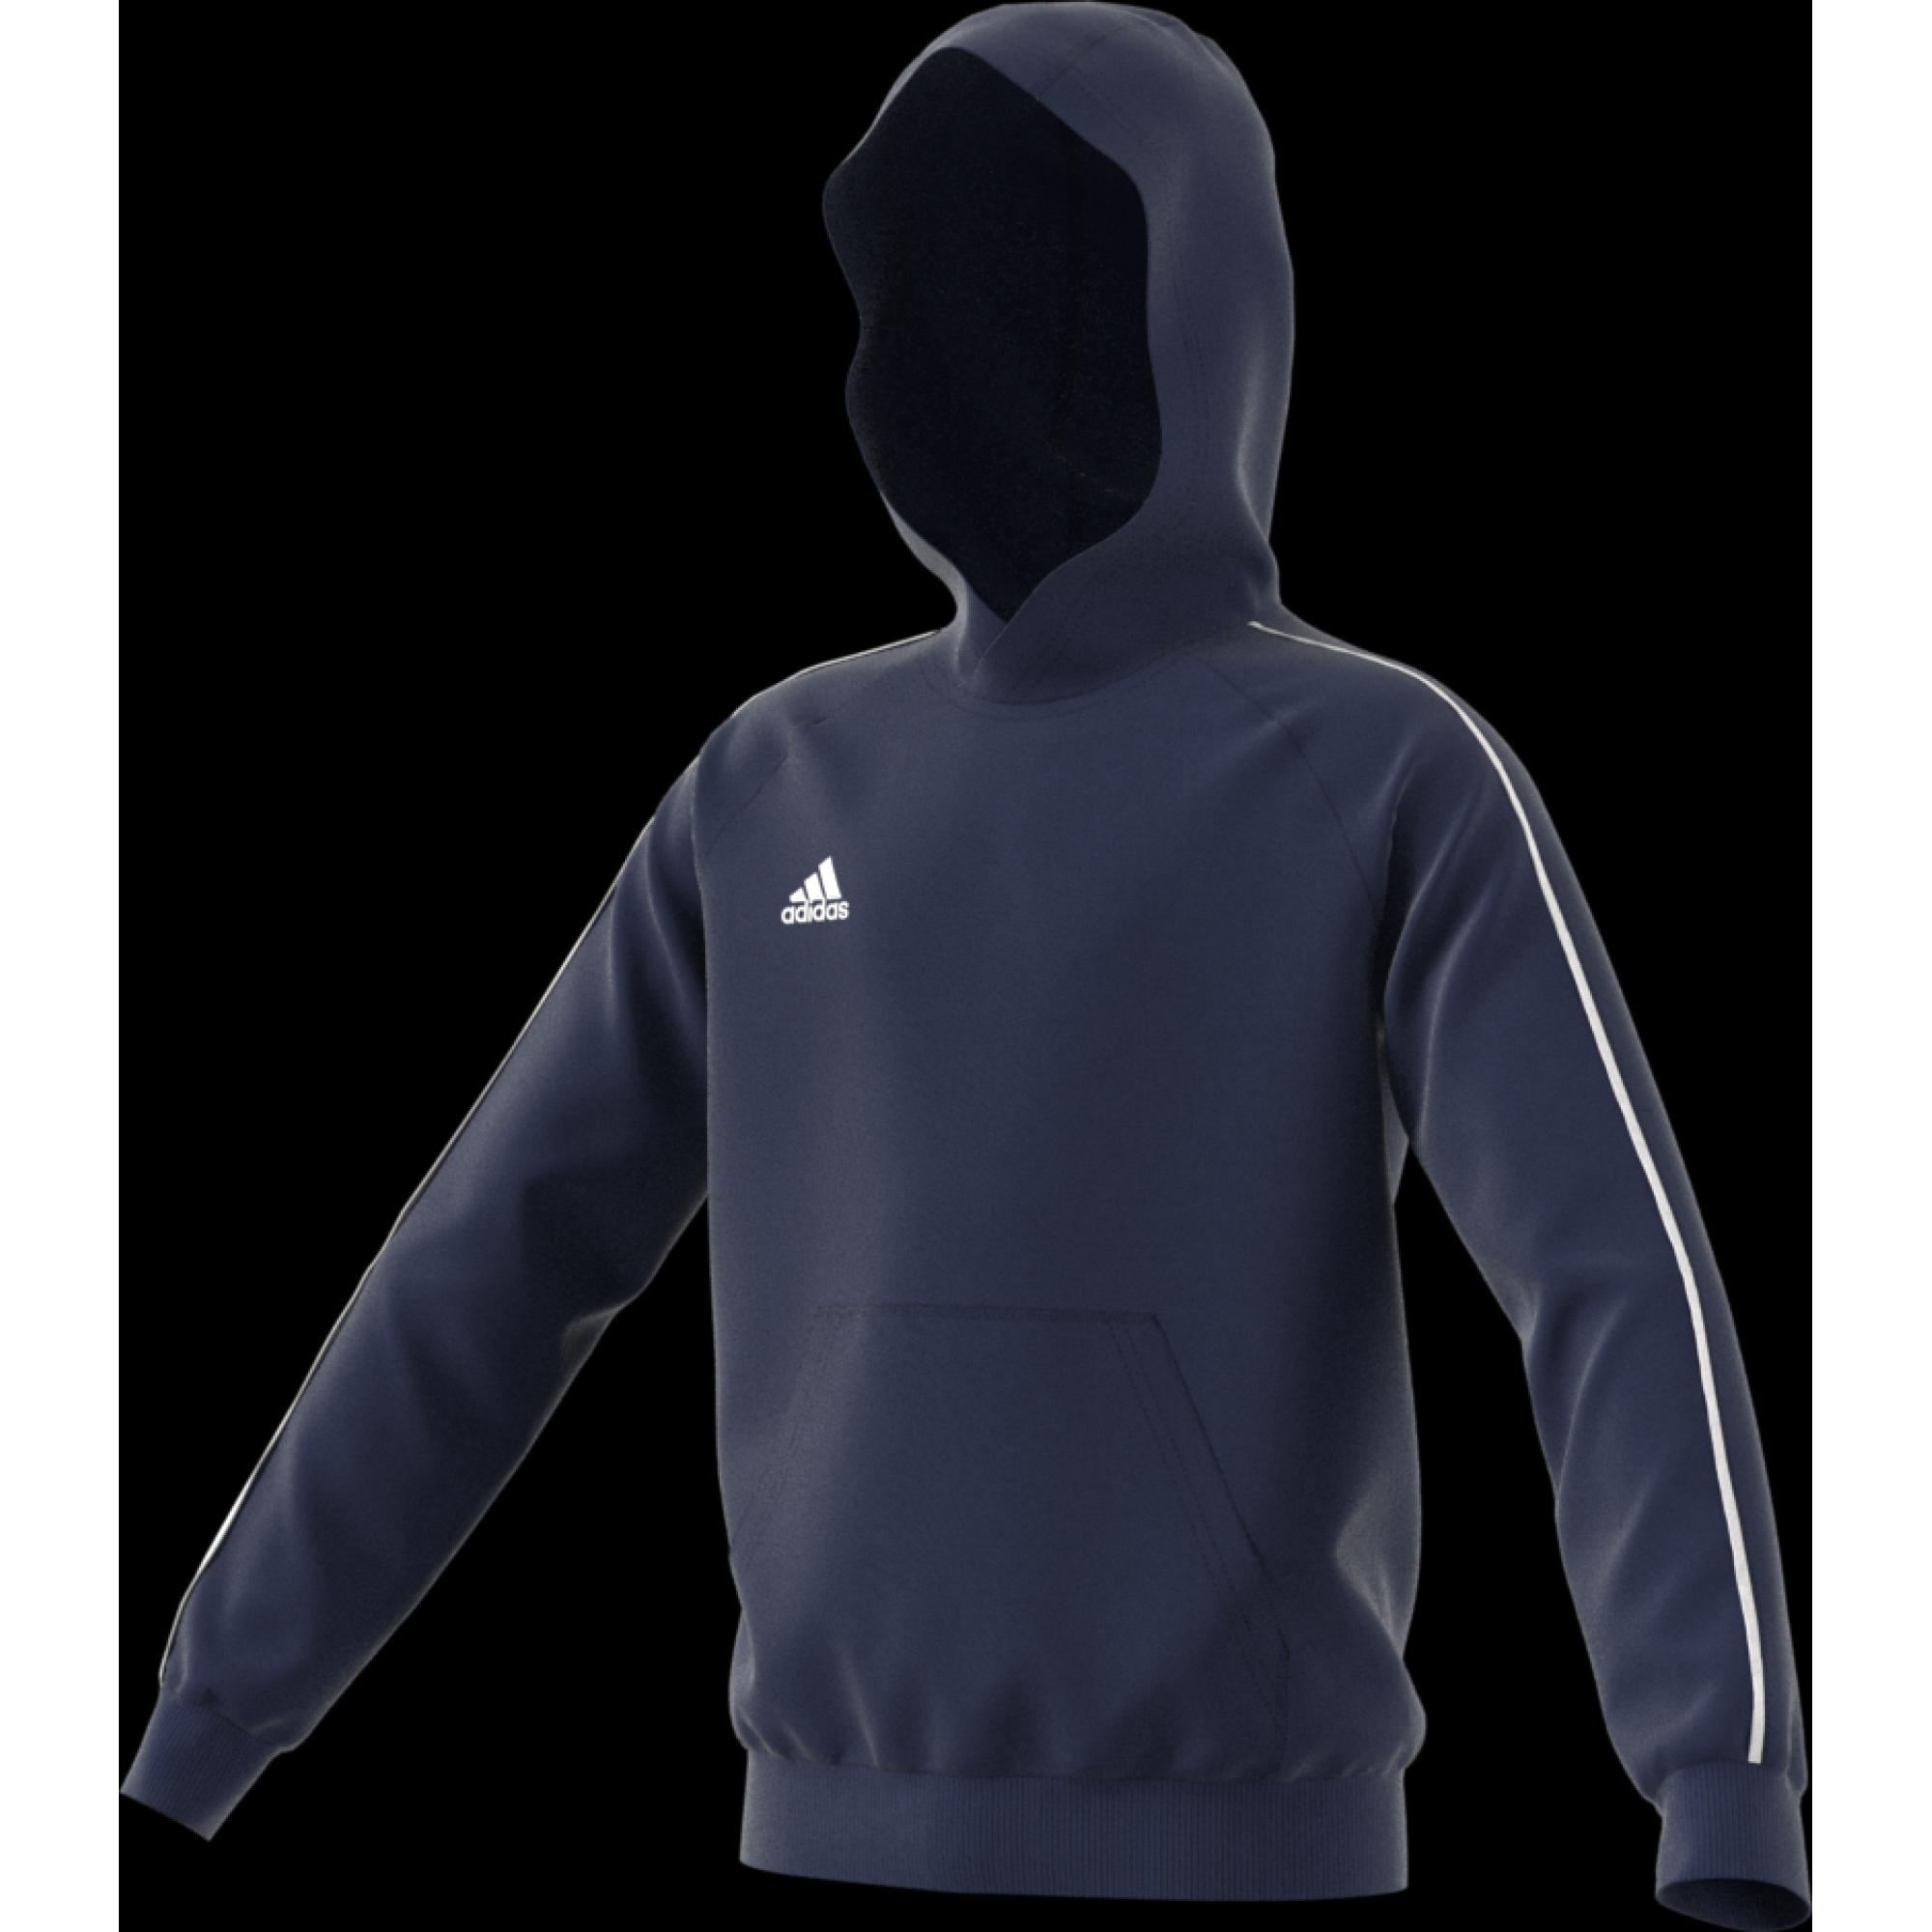 Hartley Country Club CC Adidas Navy Junior Hoody